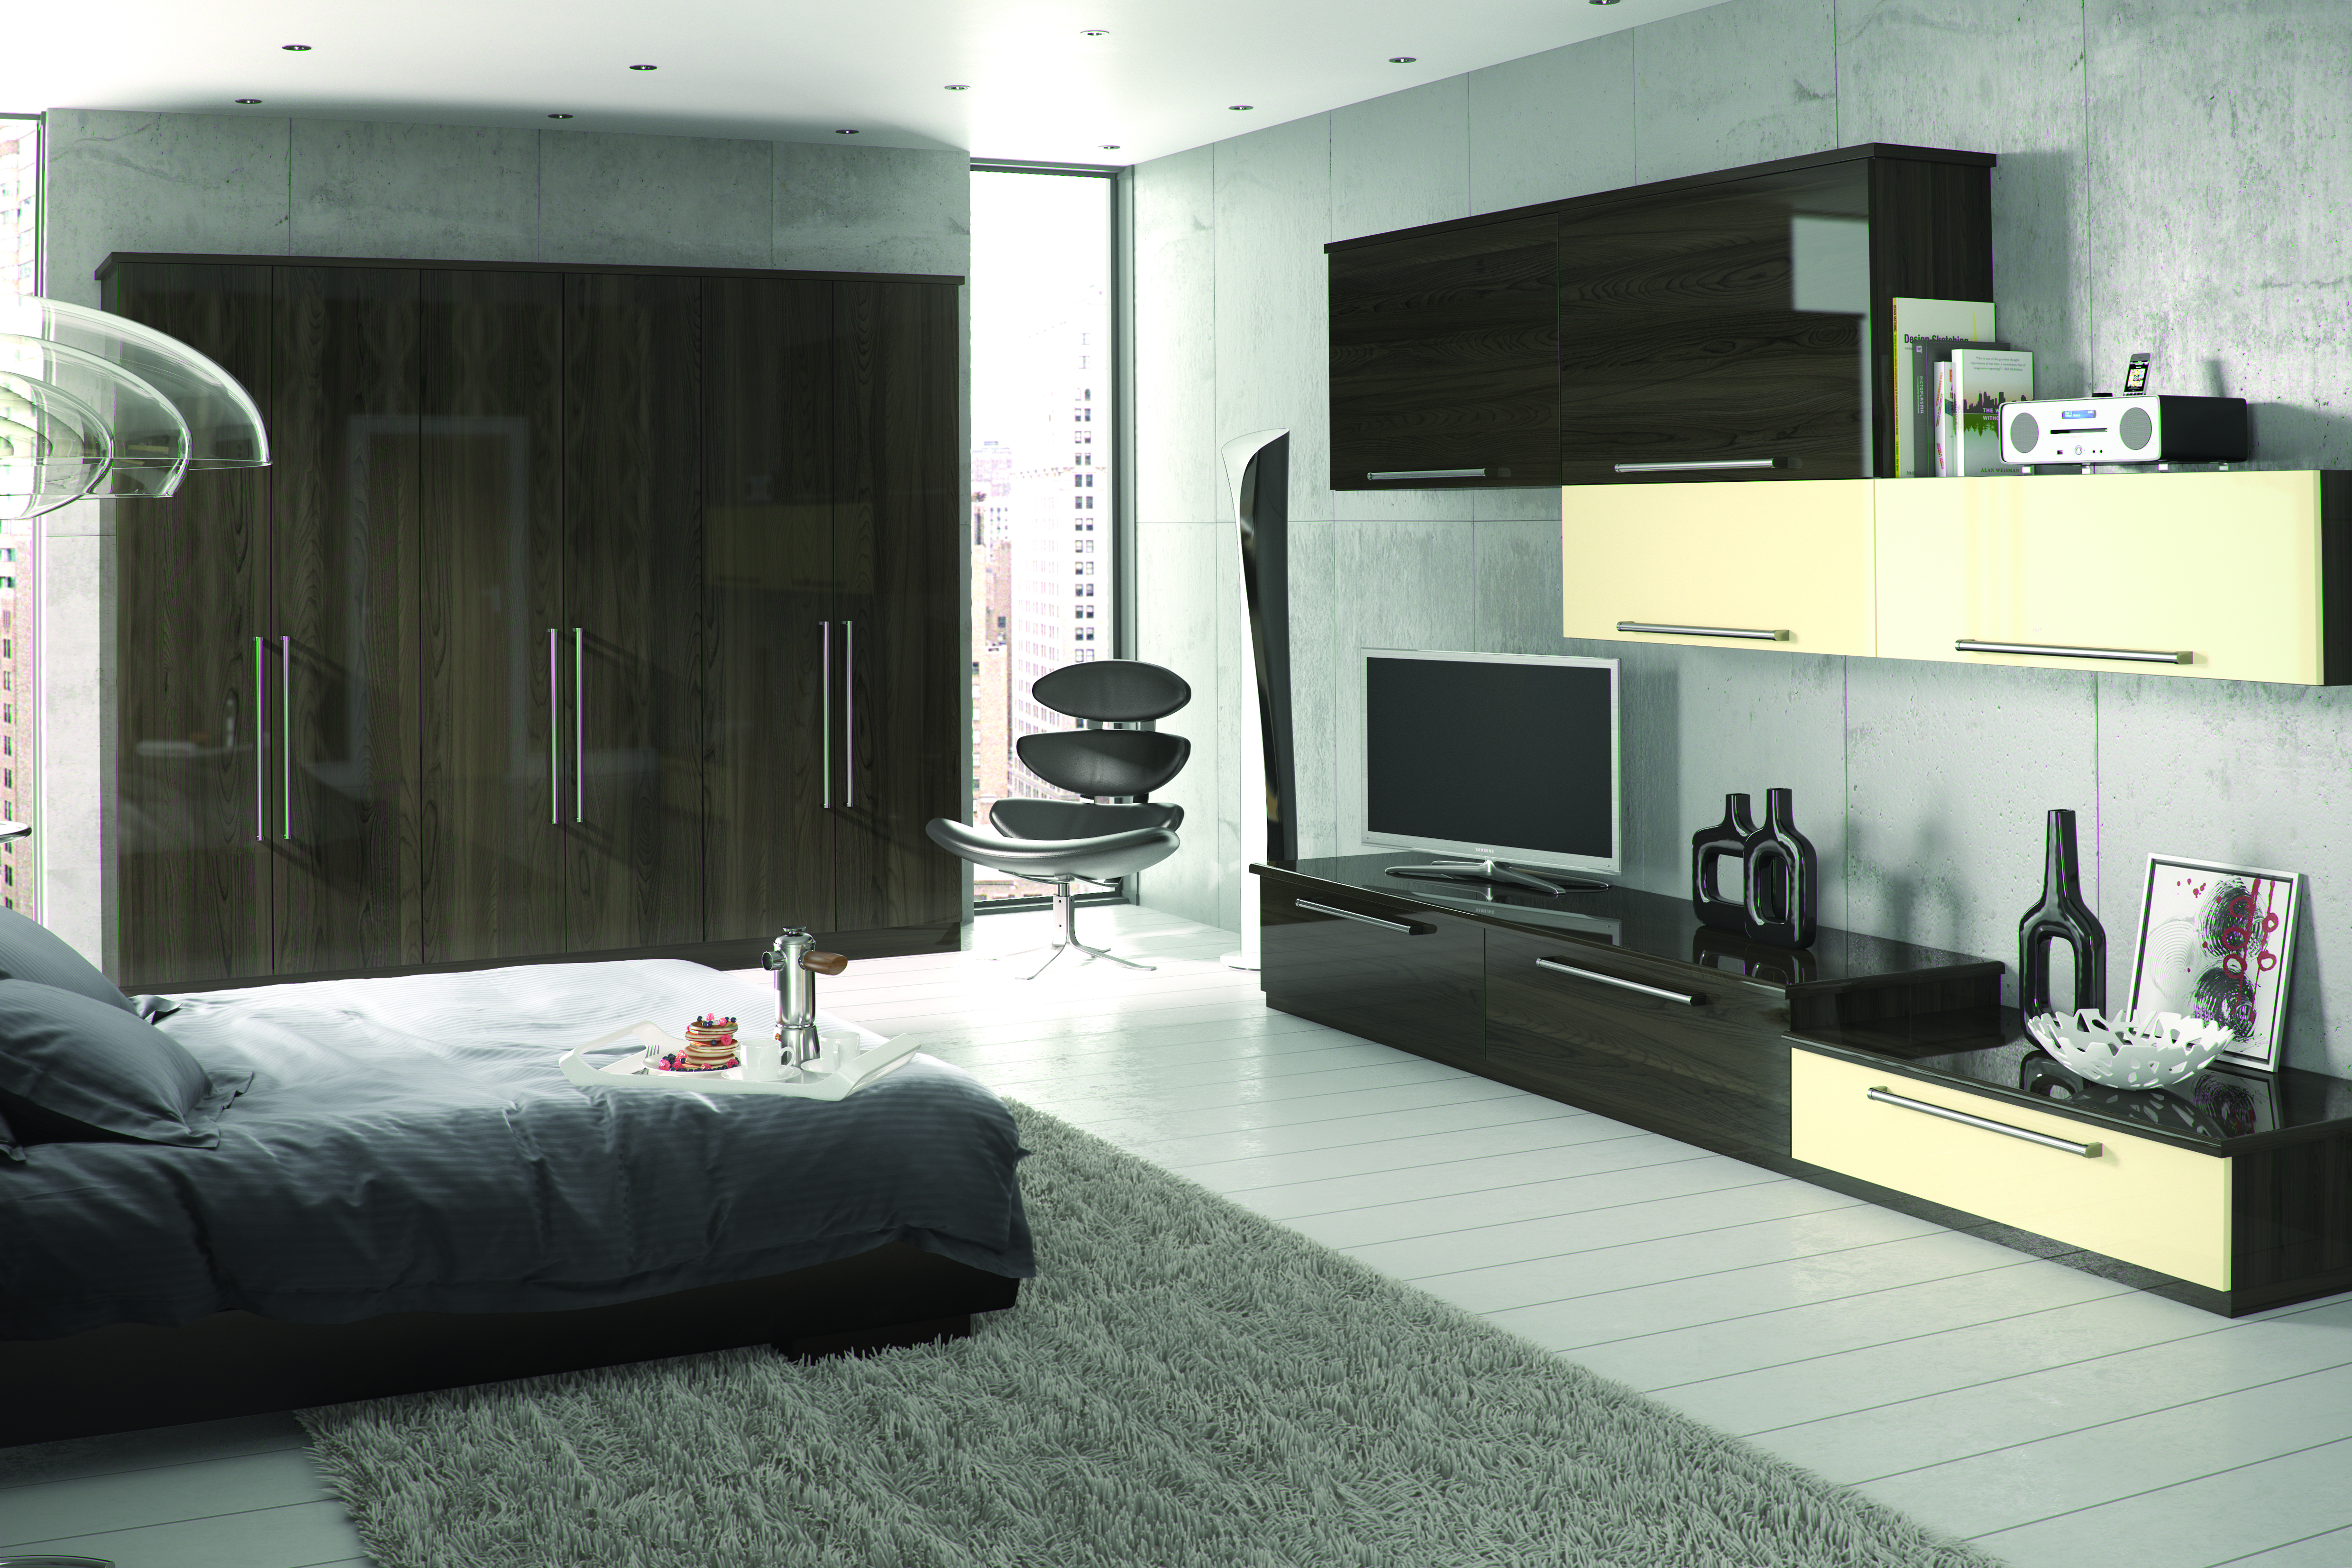 Phoenix Bedroom Furniture Made To Measure Bedrooms Northallerton North Yorkshire